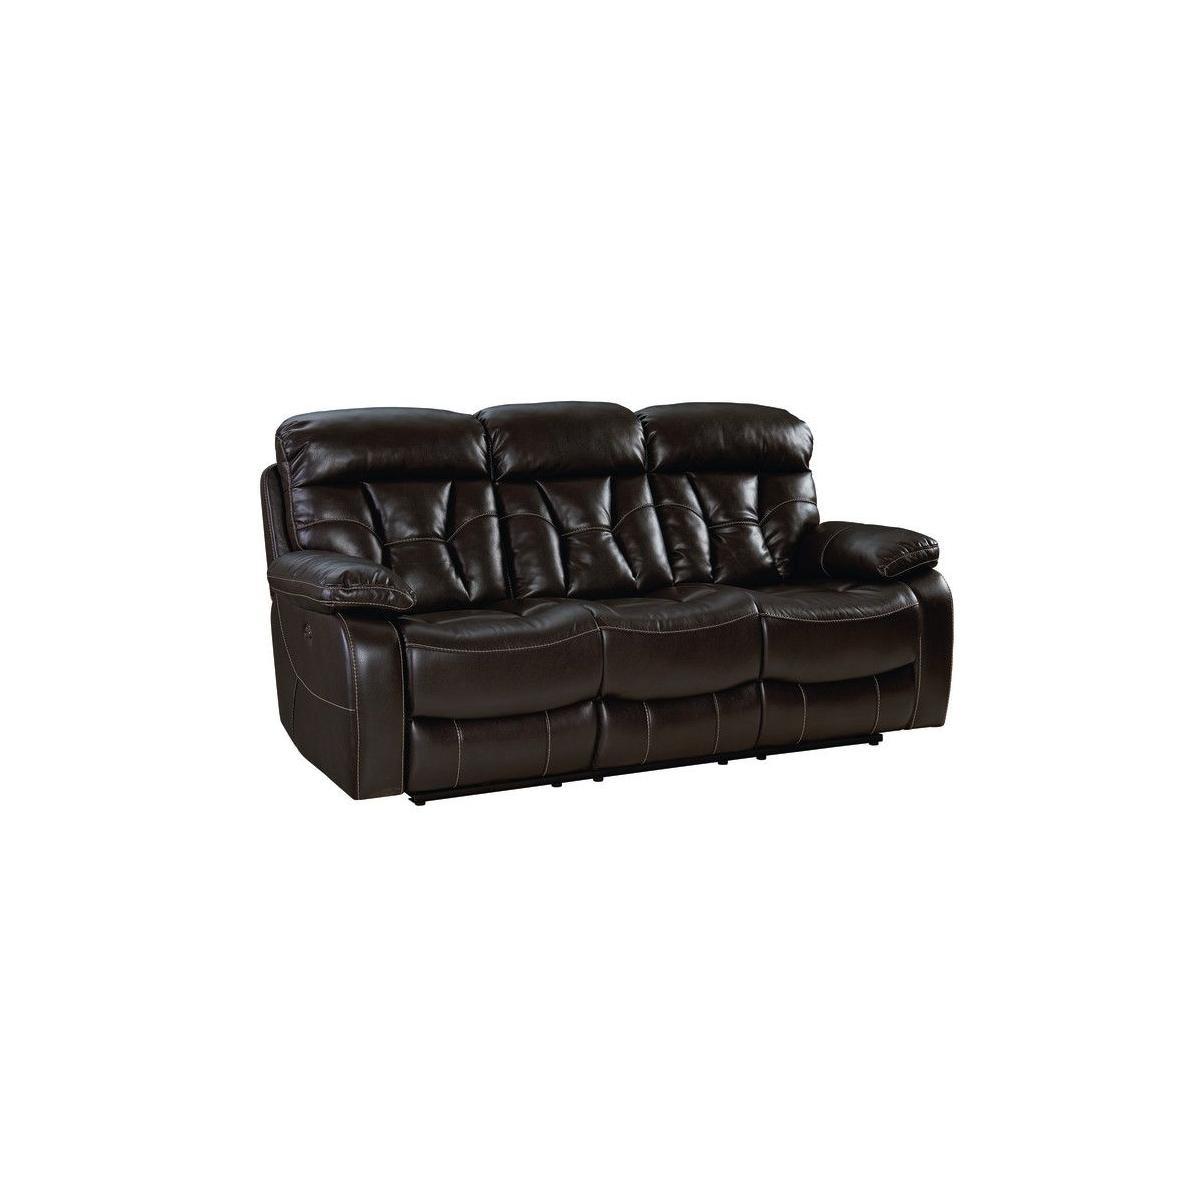 Peoria Manual Motion Dropdown Table Sofa, Brown